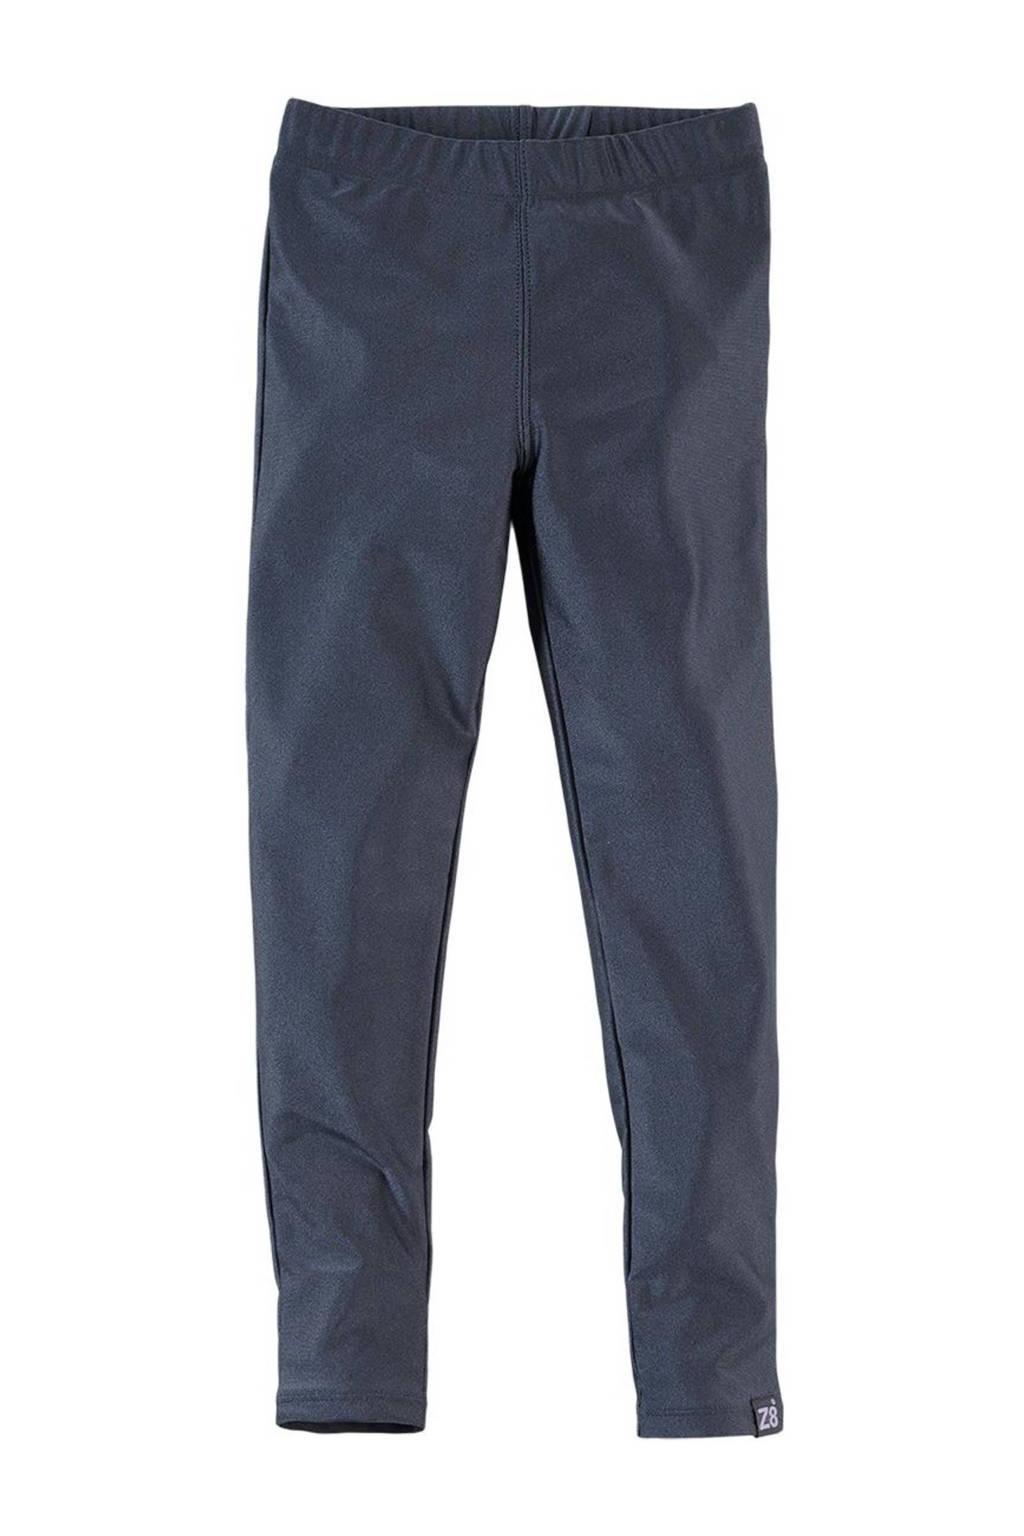 Z8 legging Giselle W22 donkerblauw, Donkerblauw